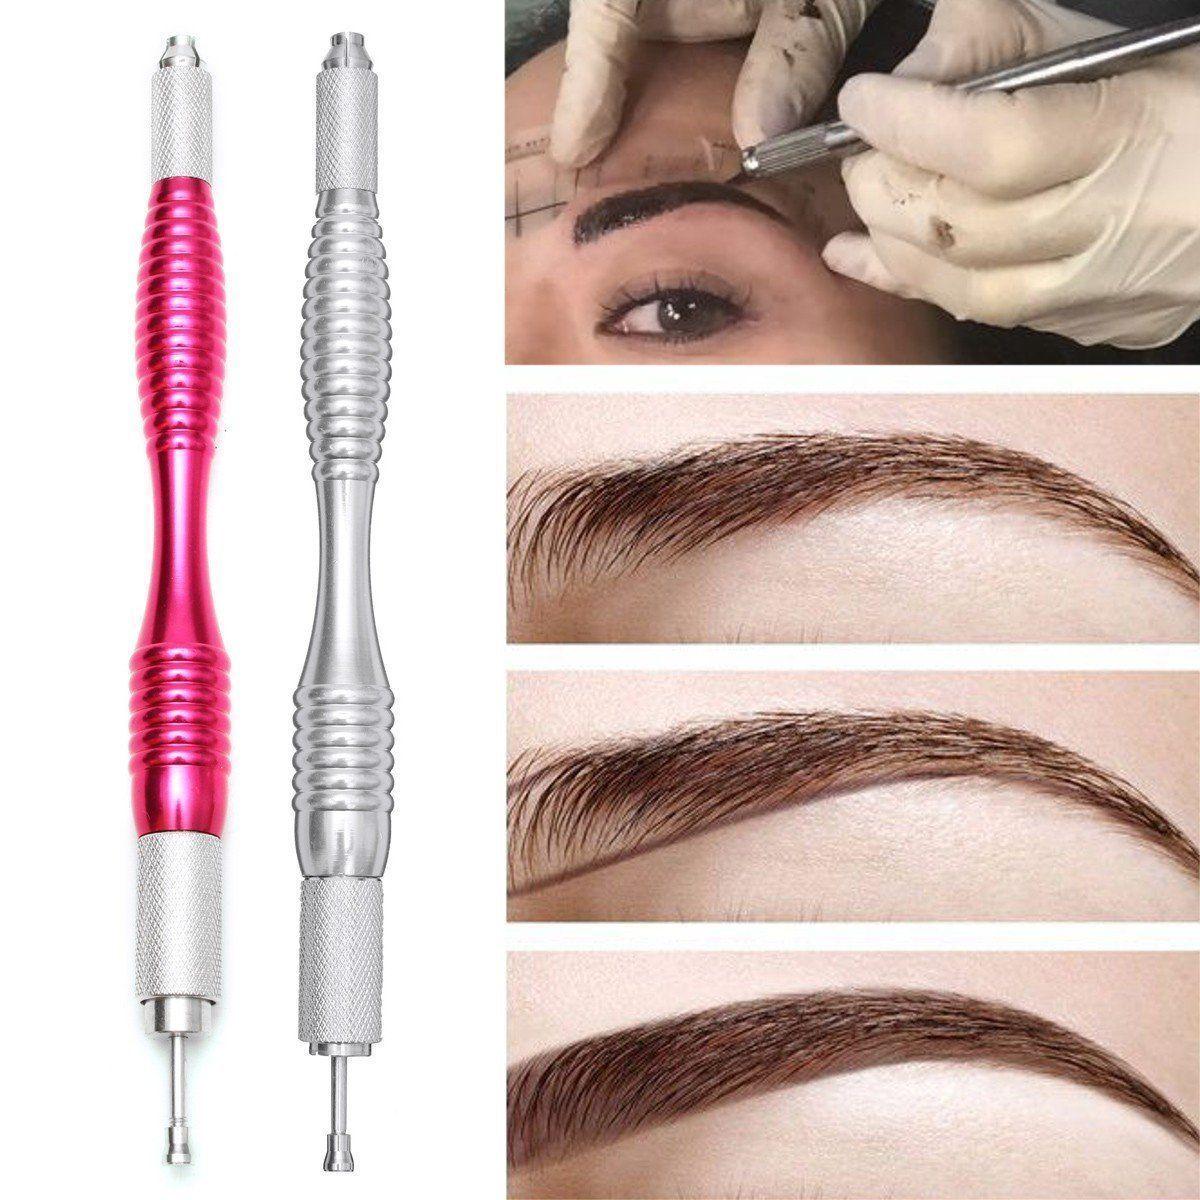 Microblading Semi Permanent Eyebrow Tattoo Pen Makeup Tool